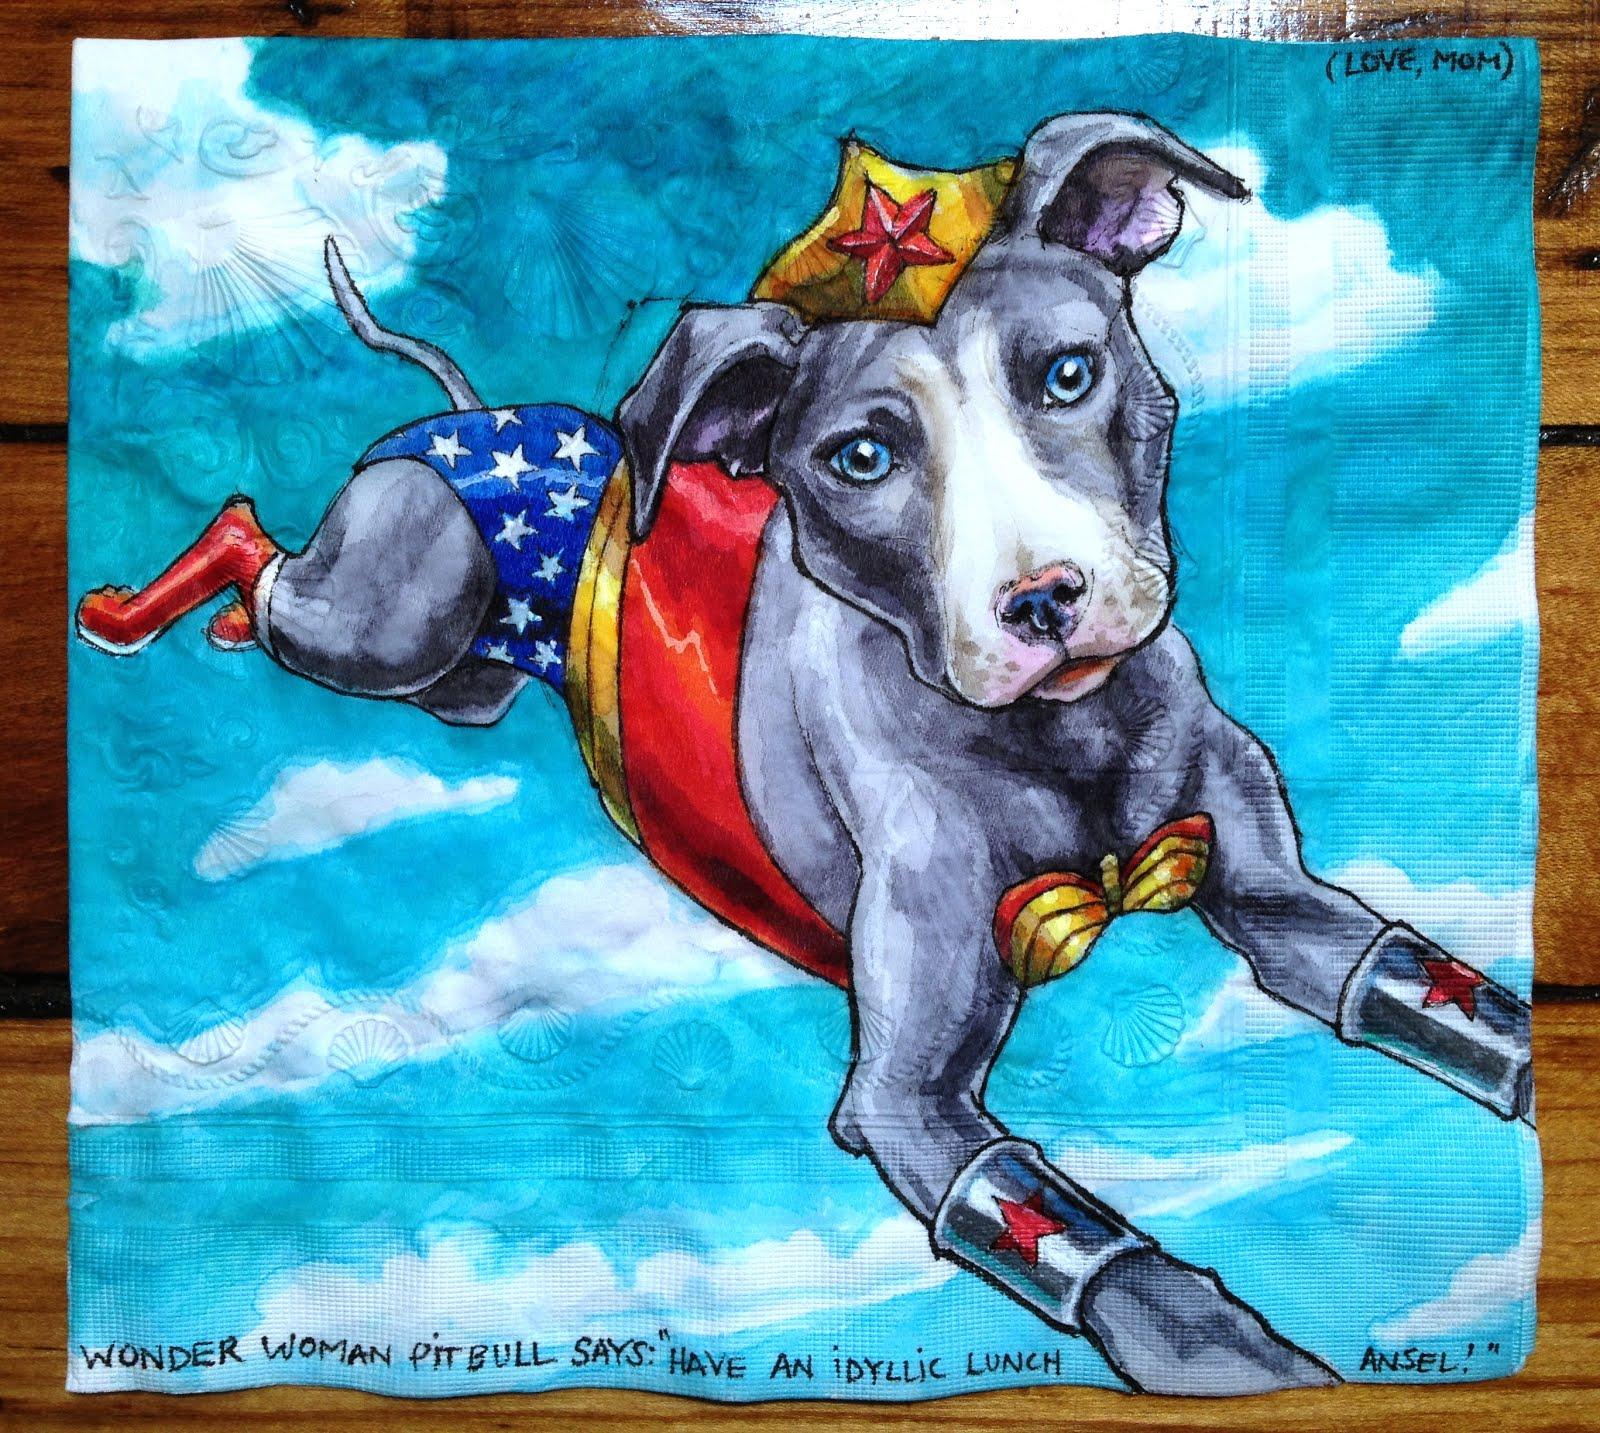 Wonder Woman Pitbull